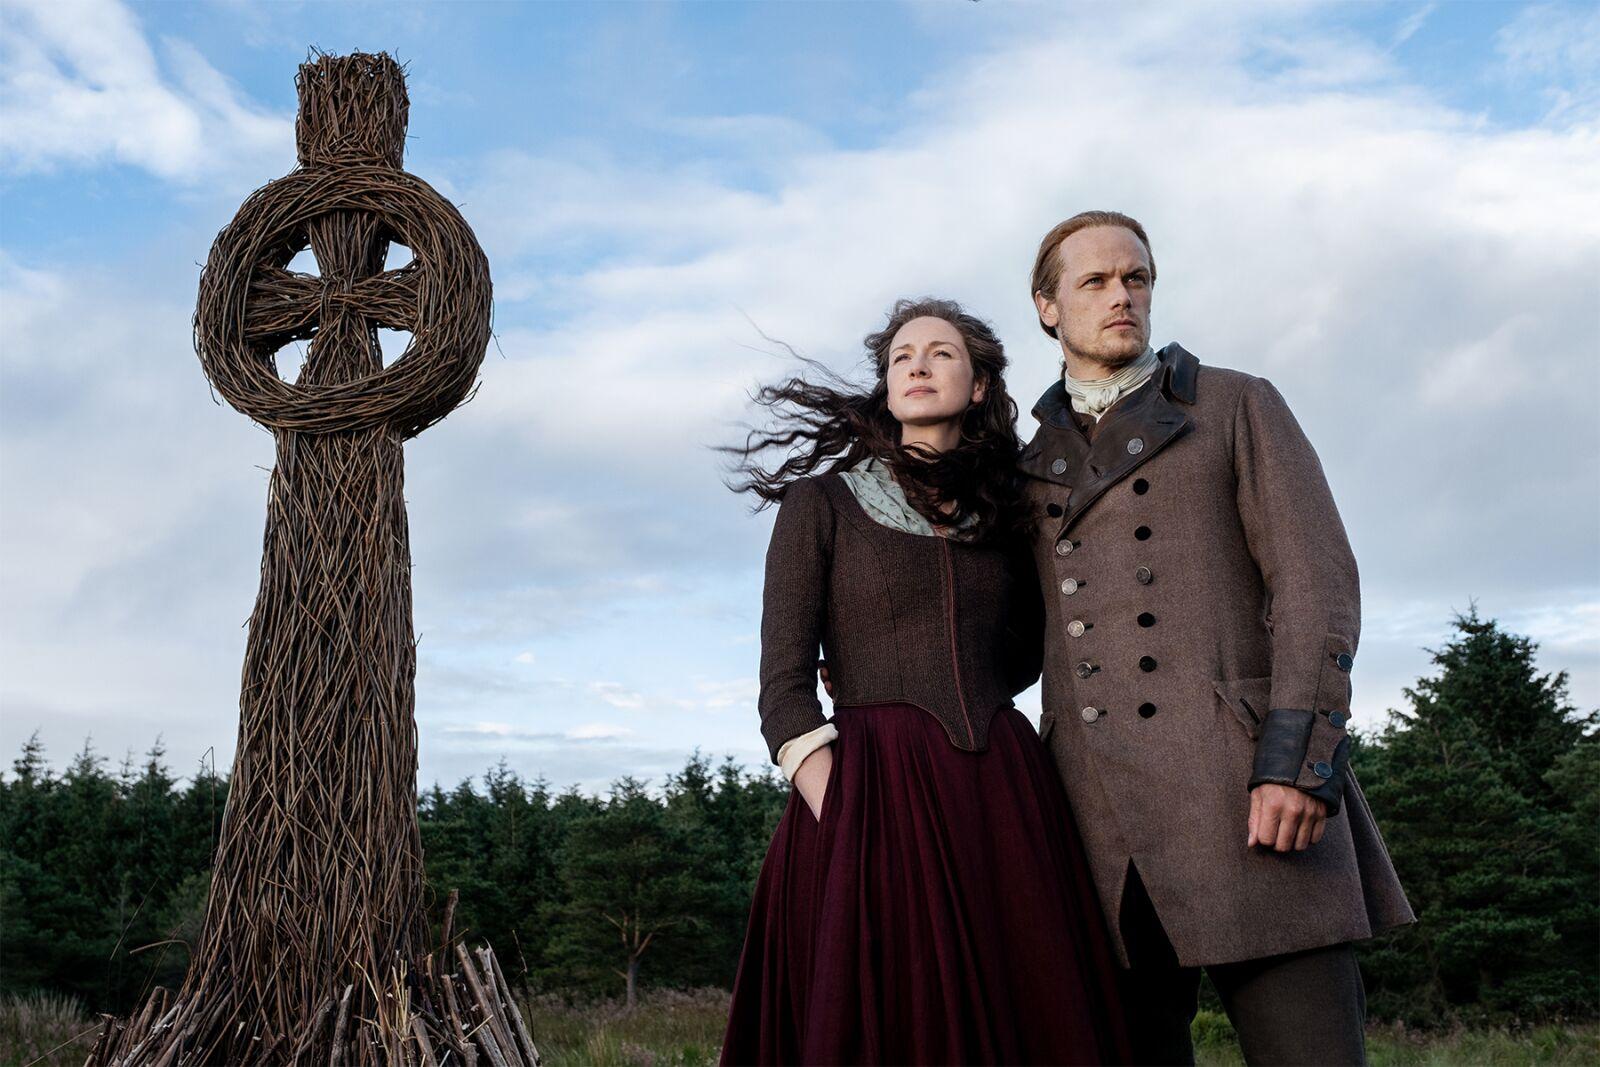 Outlander Season 5 premiere: The Murtagh situation